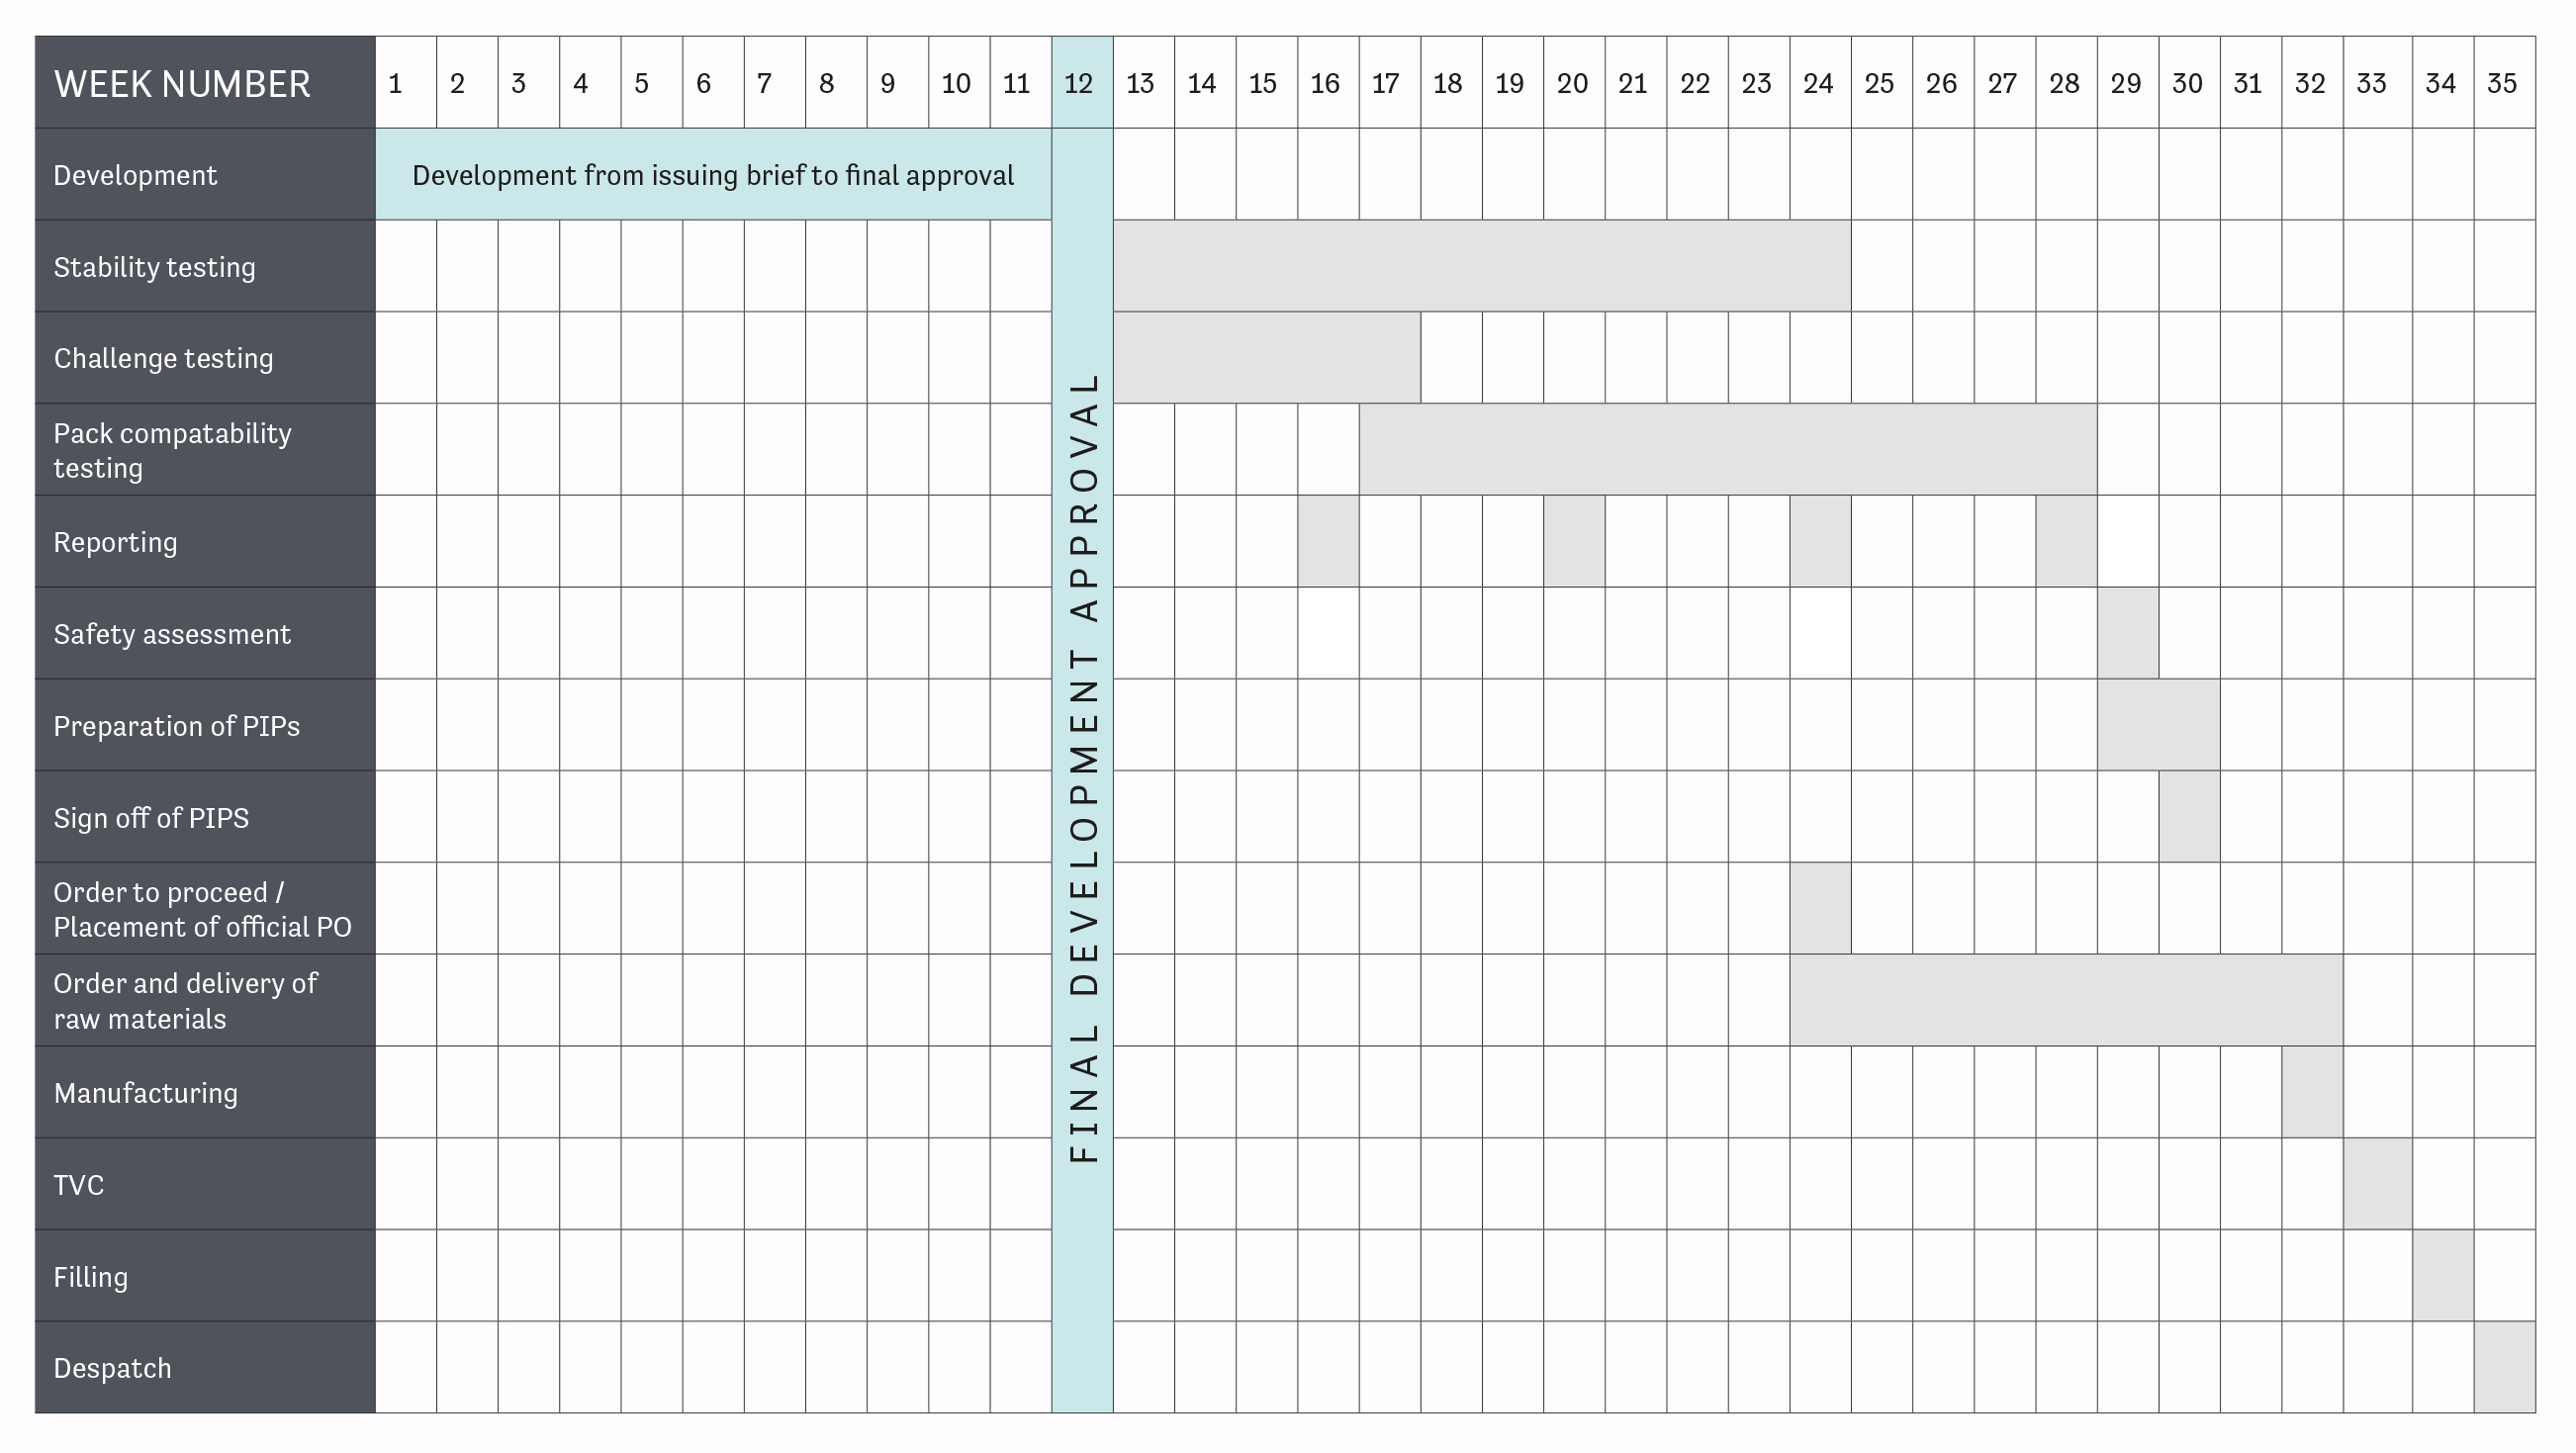 new product development timeline